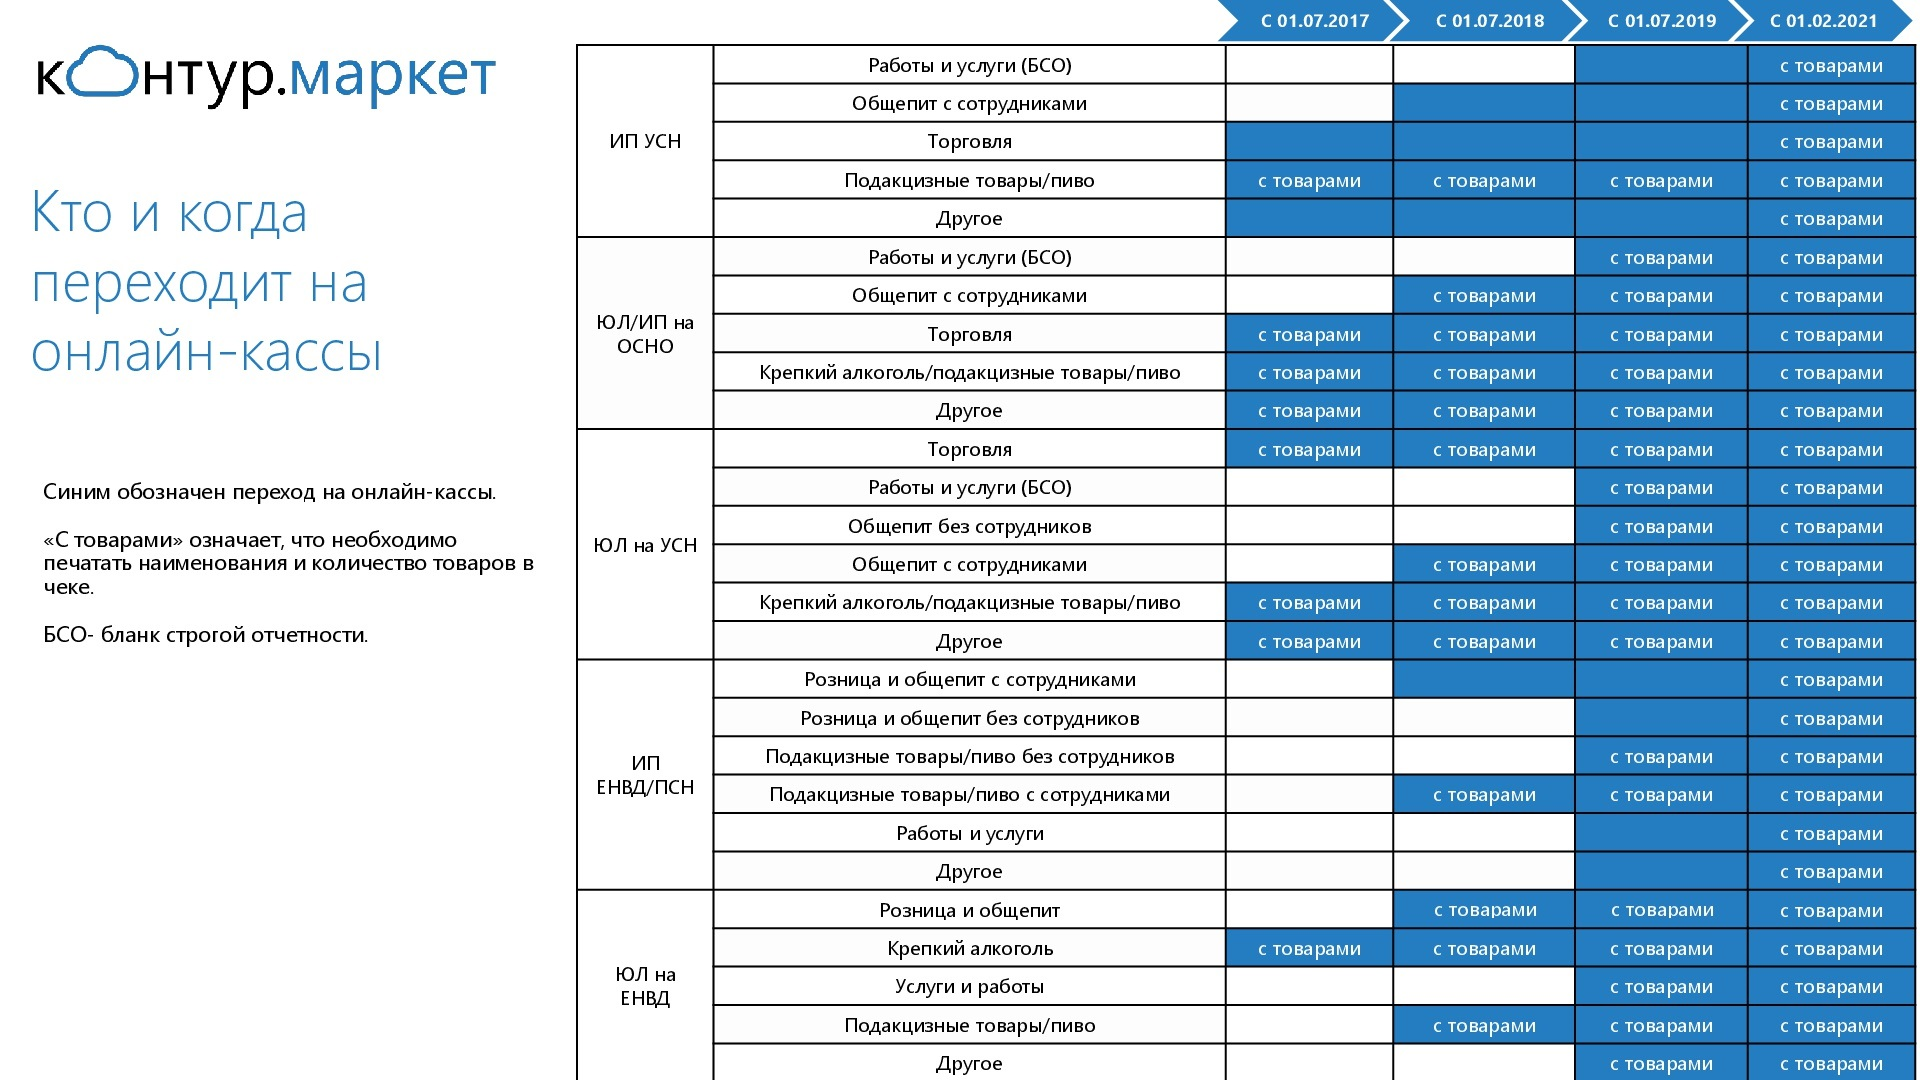 Таблица перехода на онлайн-кассы